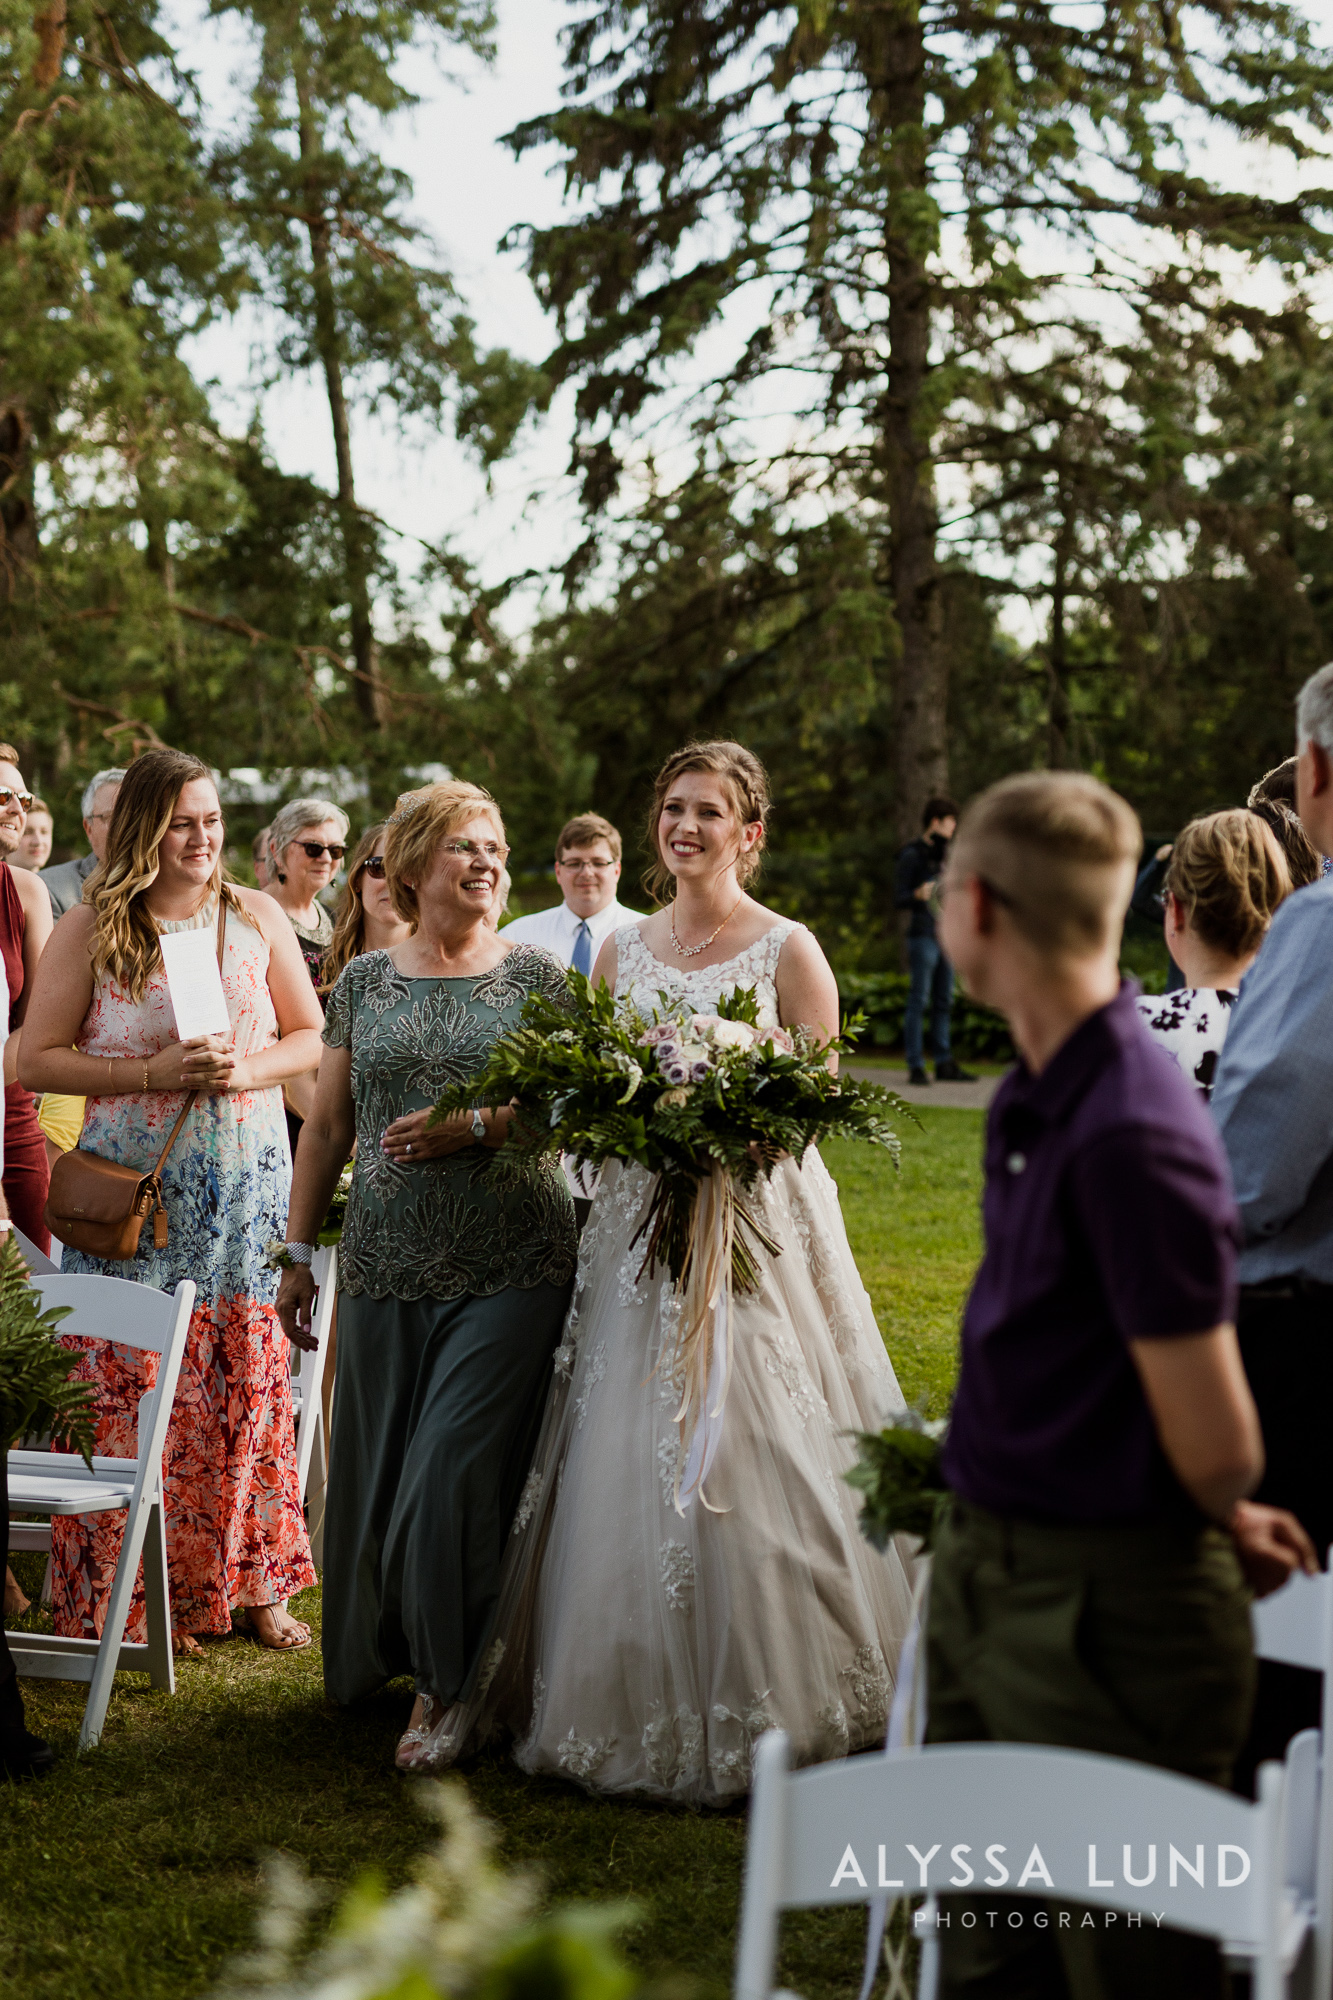 St. Paul Wedding Photography by Alyssa Lund Photography.jpg